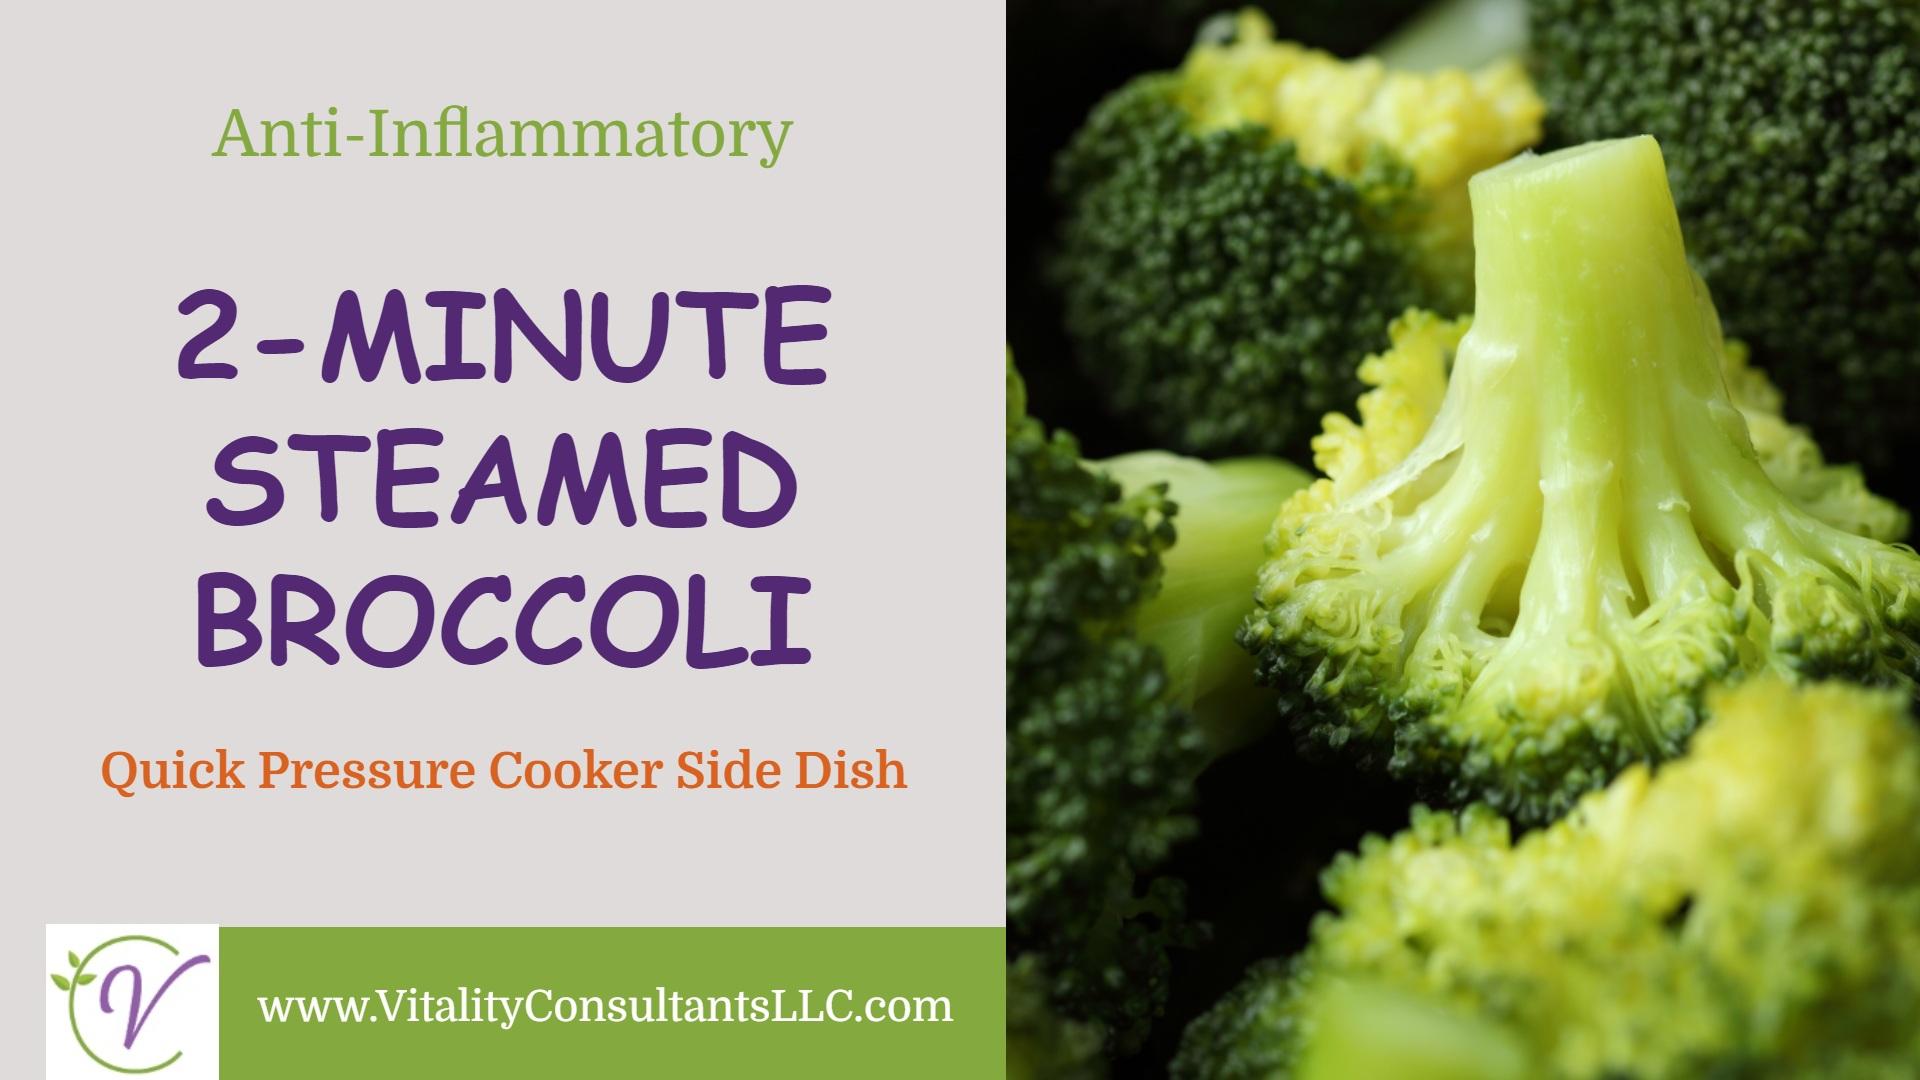 2-Minute Steamed Broccoli